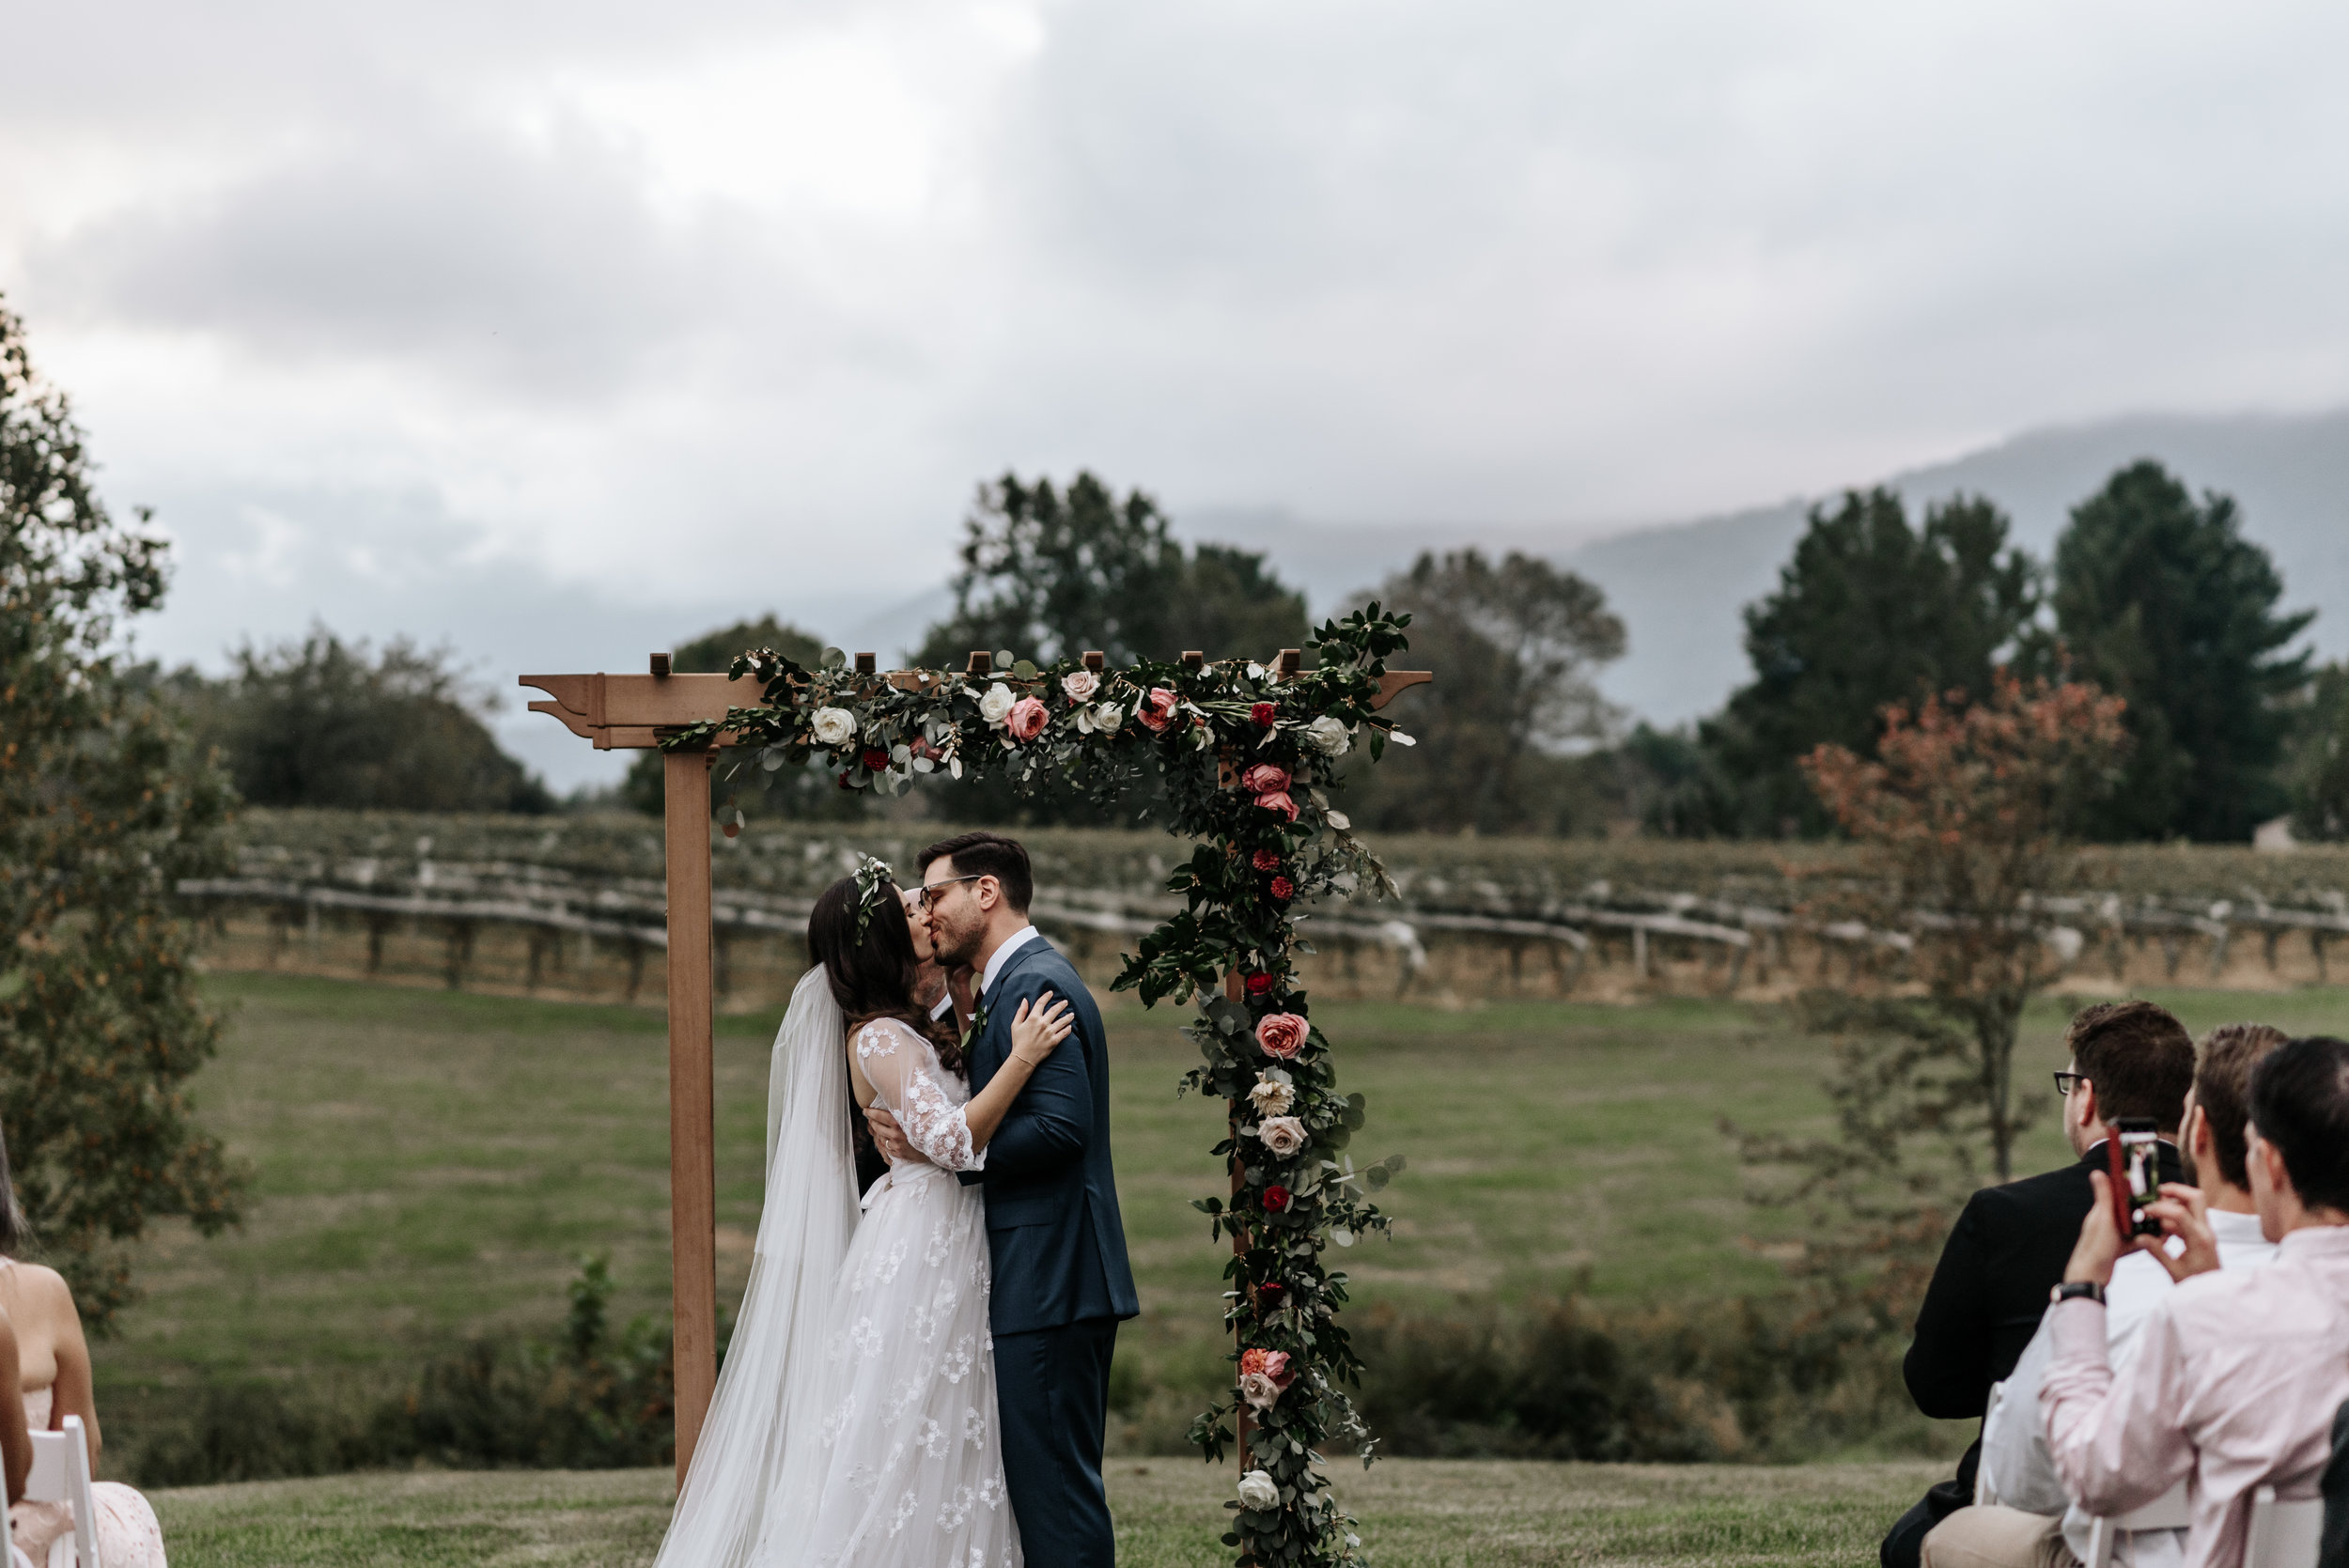 Veritas-Vineyards-and-Winery-Wedding-Photography-Afton-Virginia-Yasmin-Seth-Photography-by-V-2877.jpg